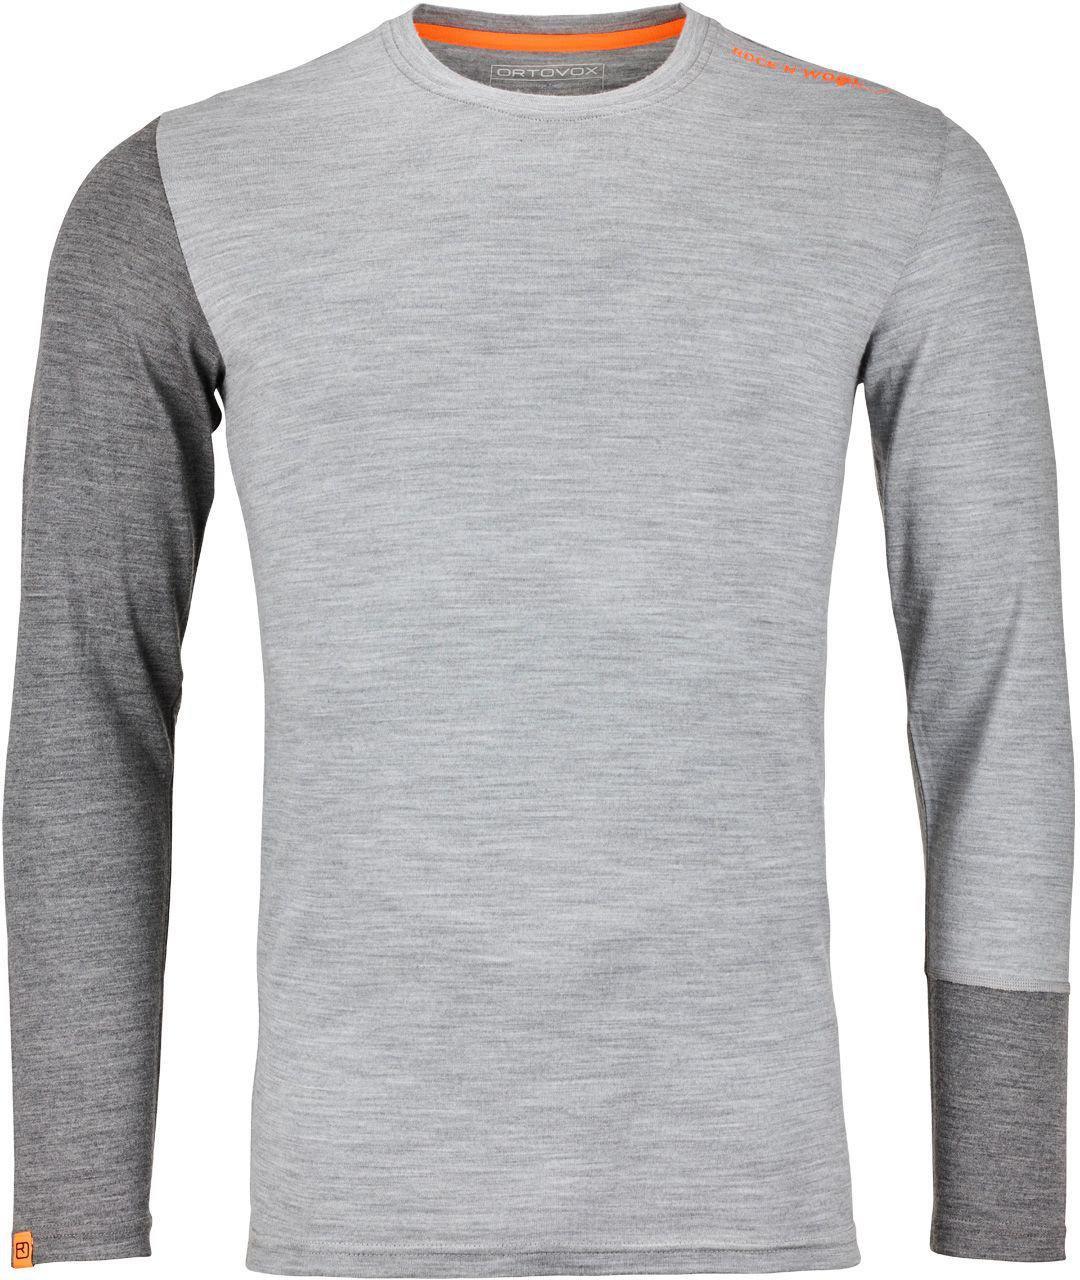 2903cc9f7b7724 Ortovox Long Sleeve 185 Merino Rock n Wool Men günstig kaufen